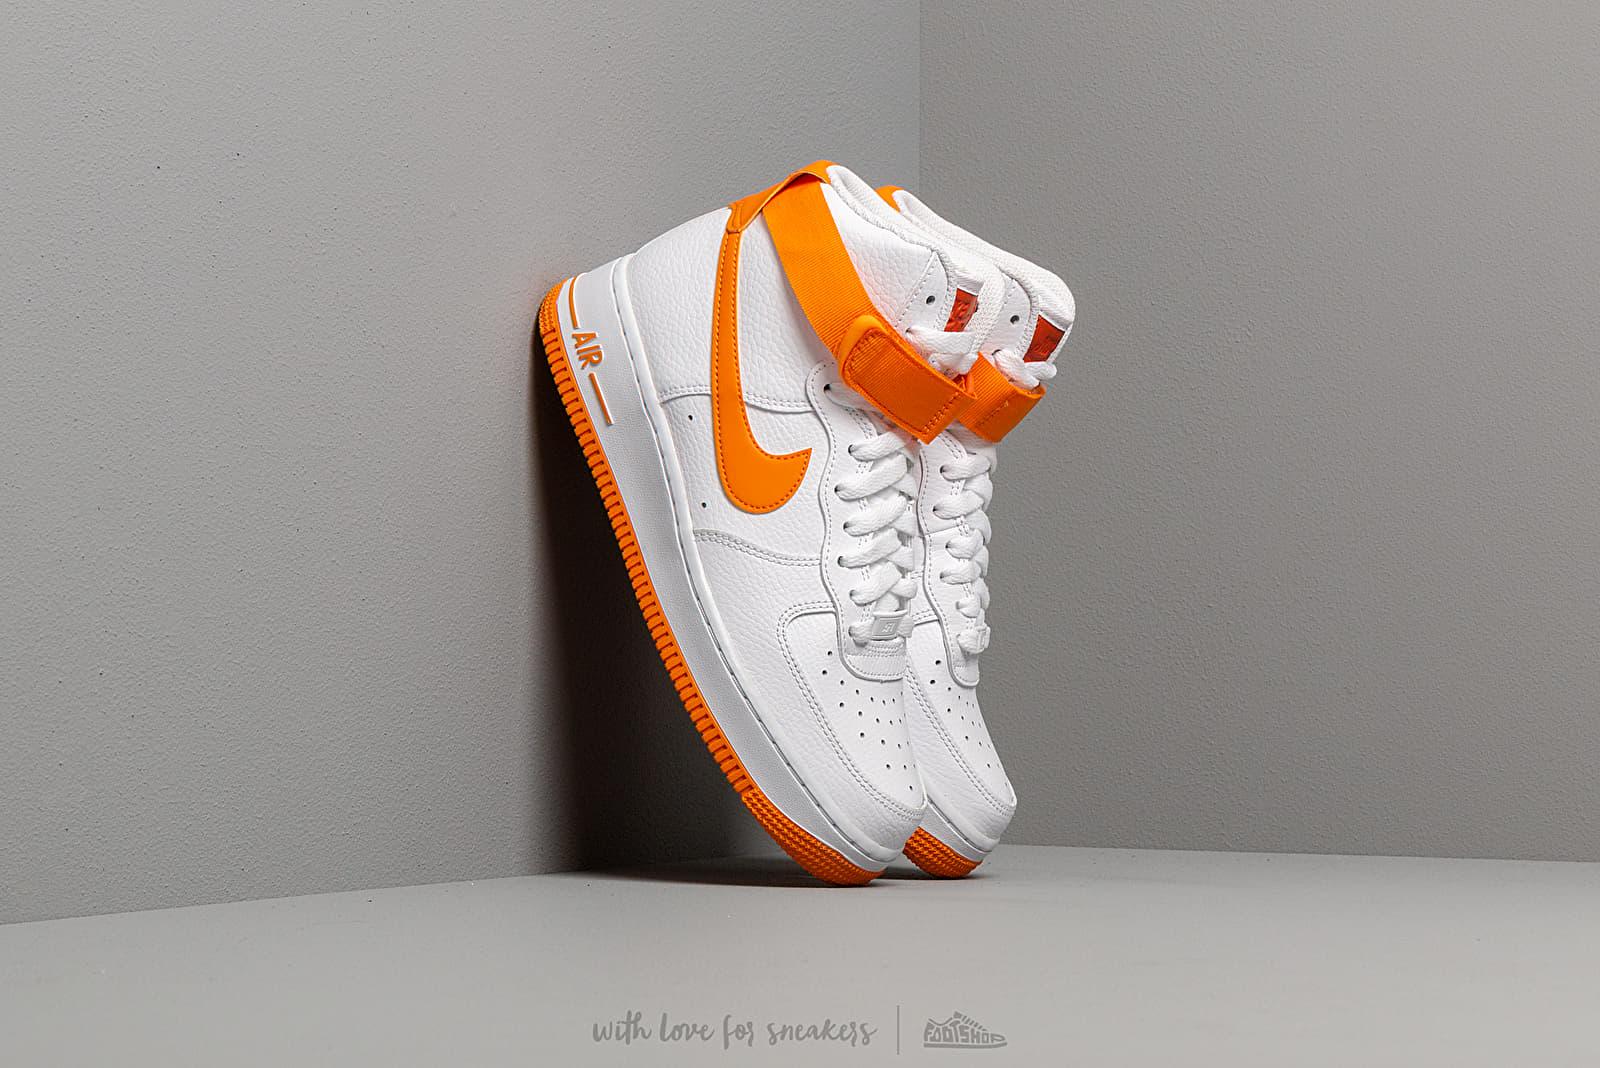 Nike Wmns Air Force 1 High White/ Orange Peel-Campfire Orange | Footshop